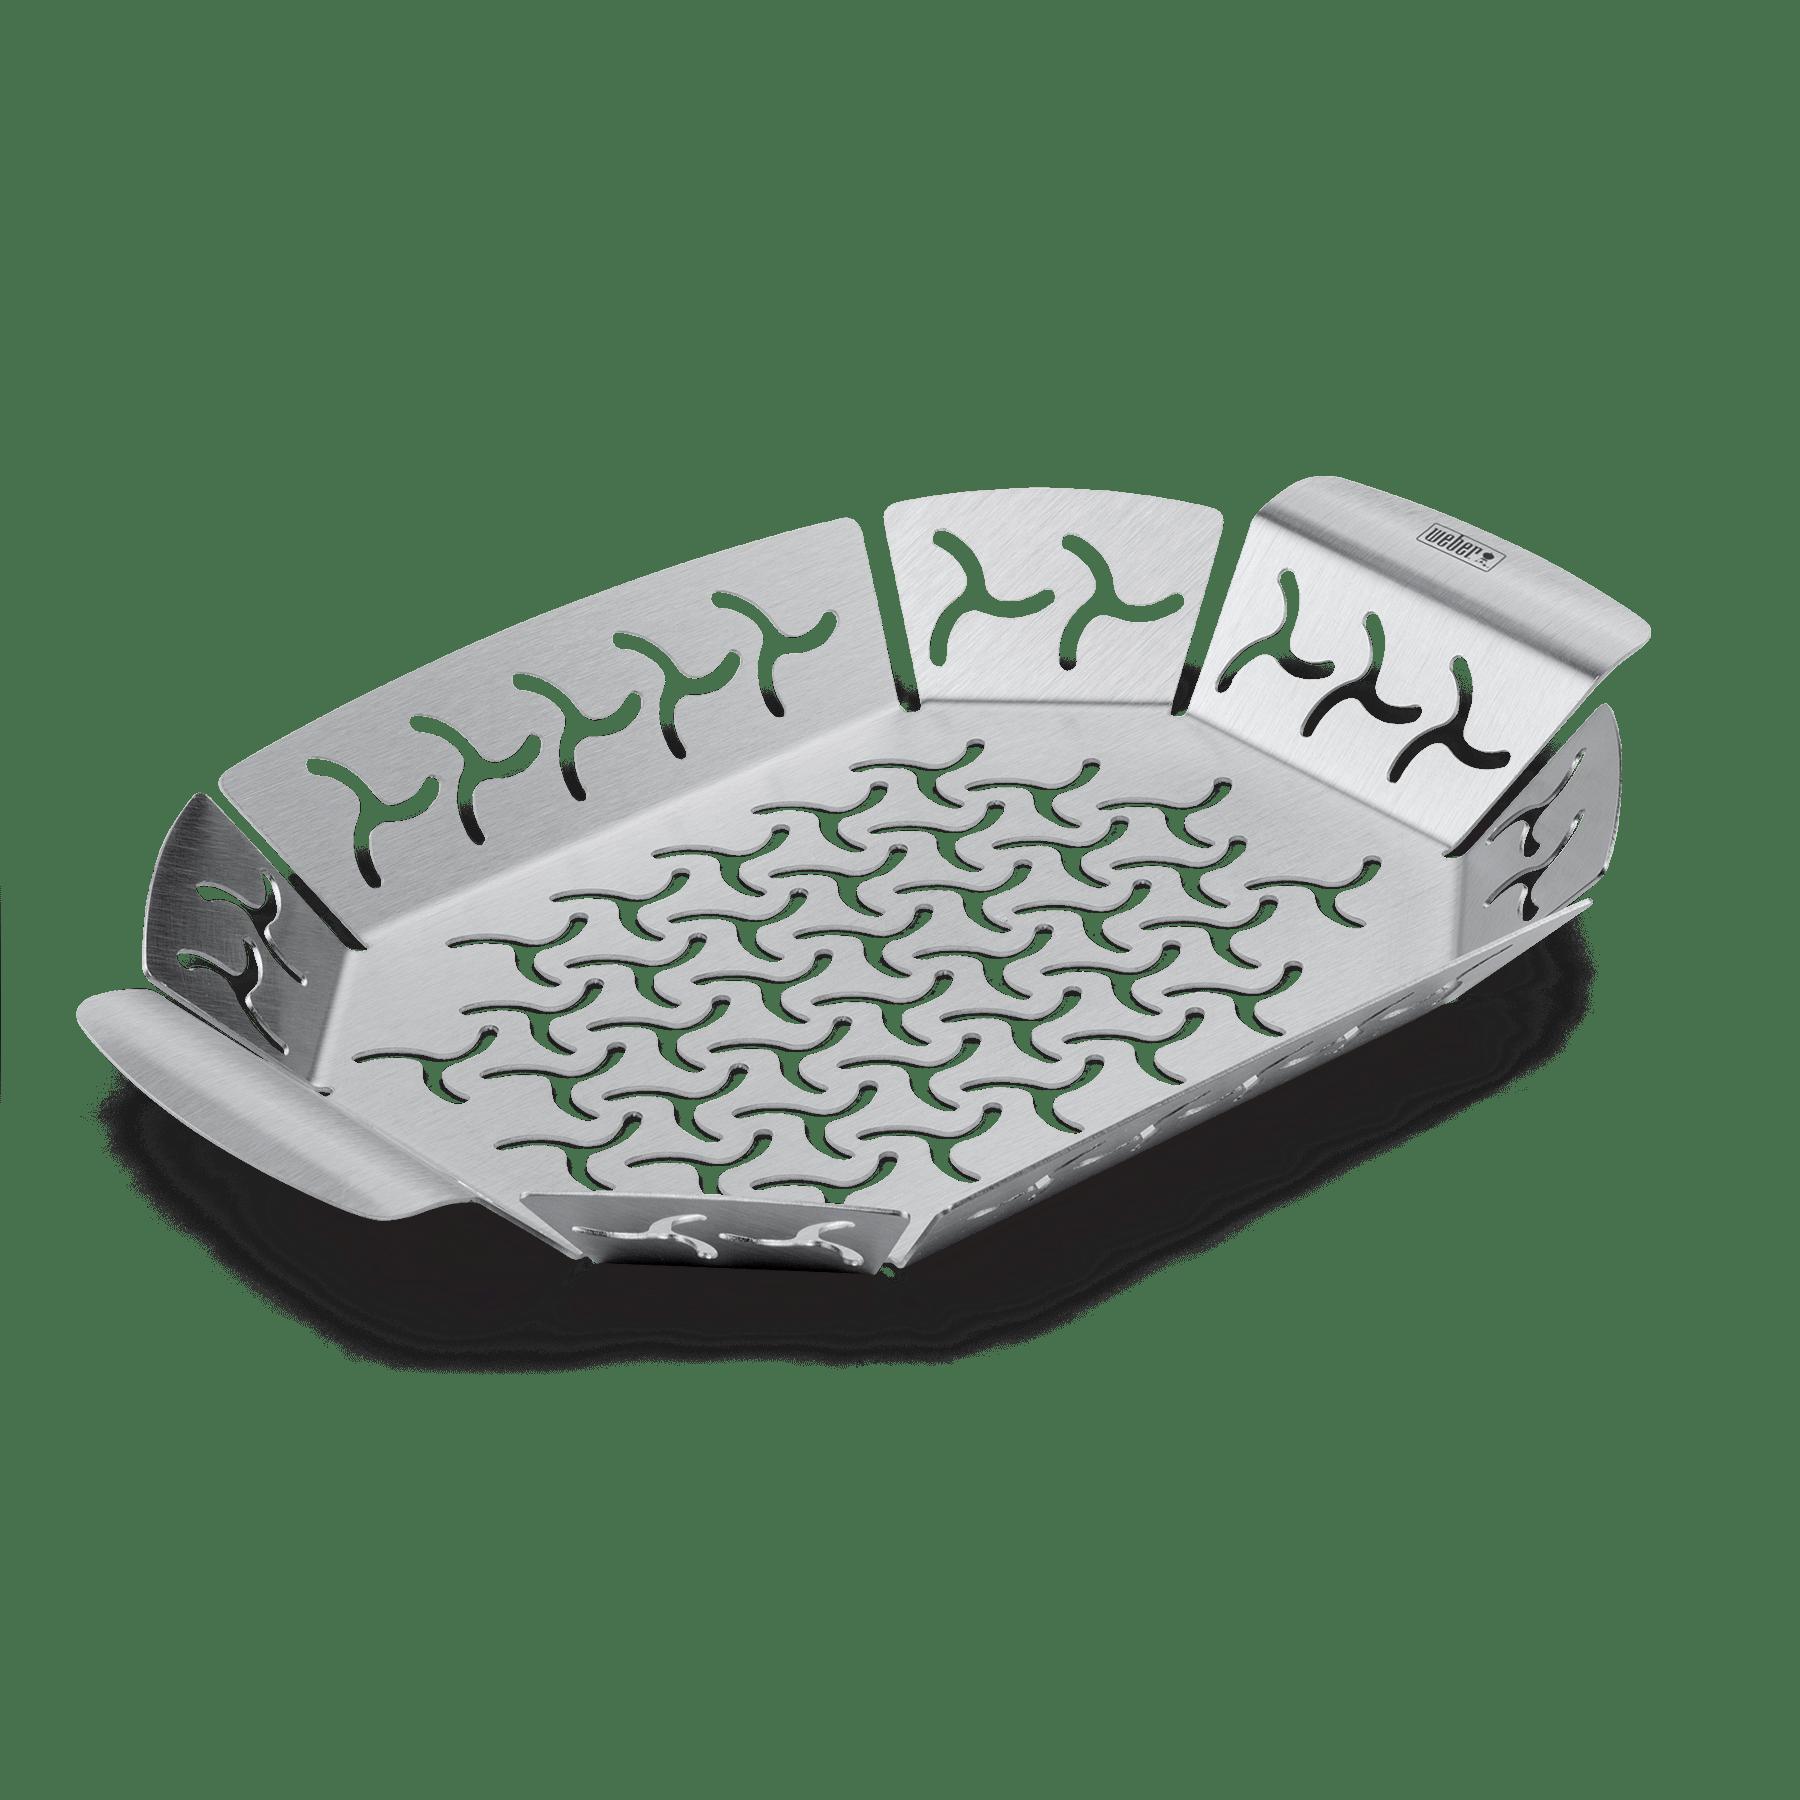 Grillform - Liten